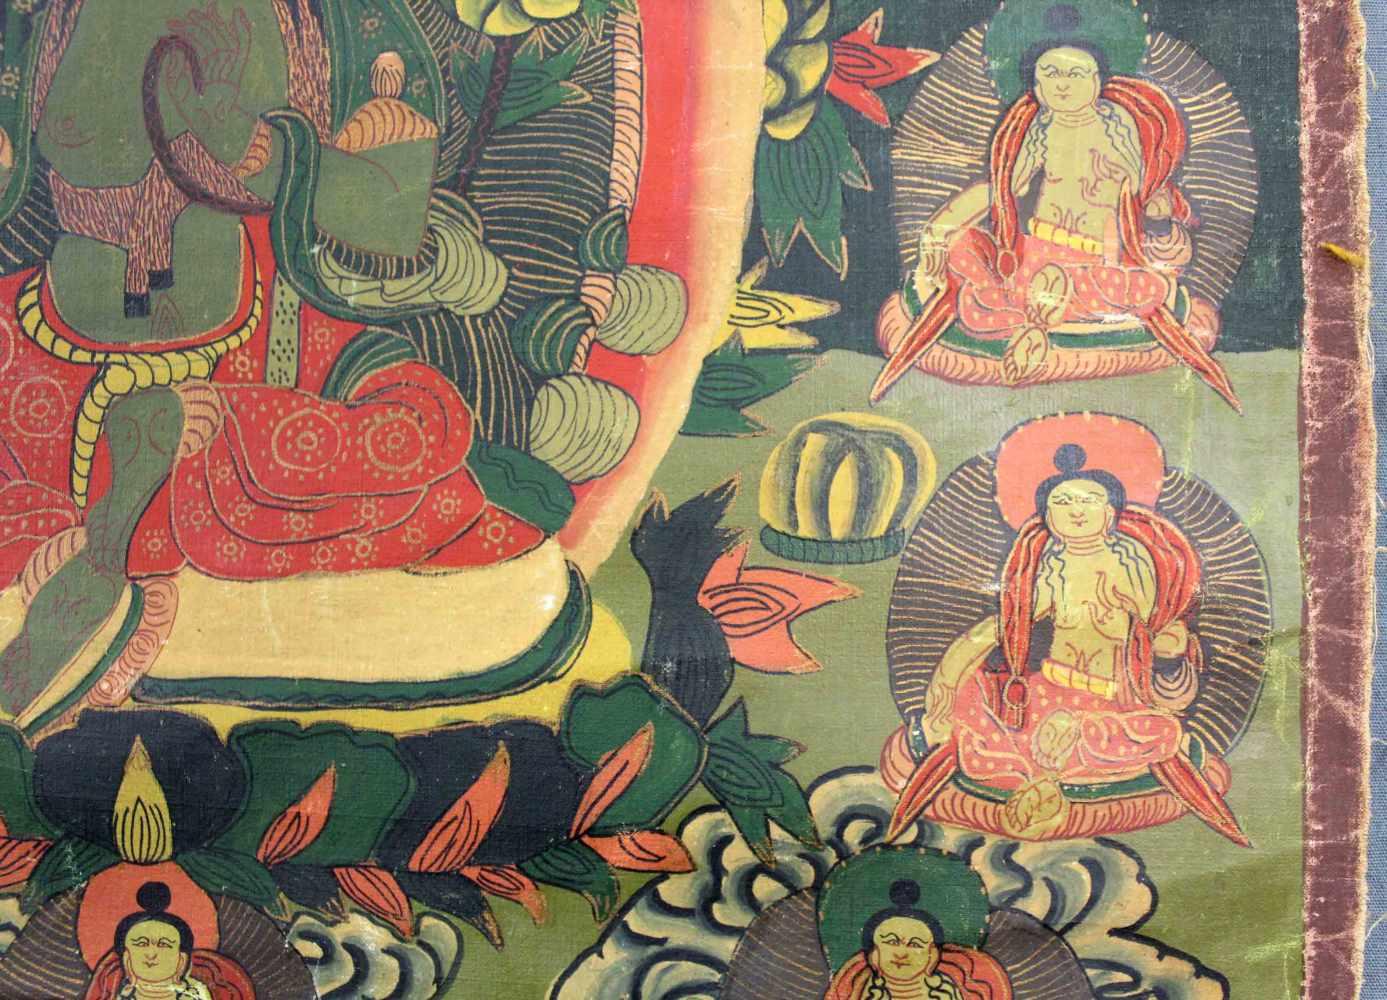 Lot 48 - Tara ? Thangka, China / Tibet alt.60,5 cm x 47 cm. Gemälde.Tara ? Thangka, China / Tibet old.60,5 cm